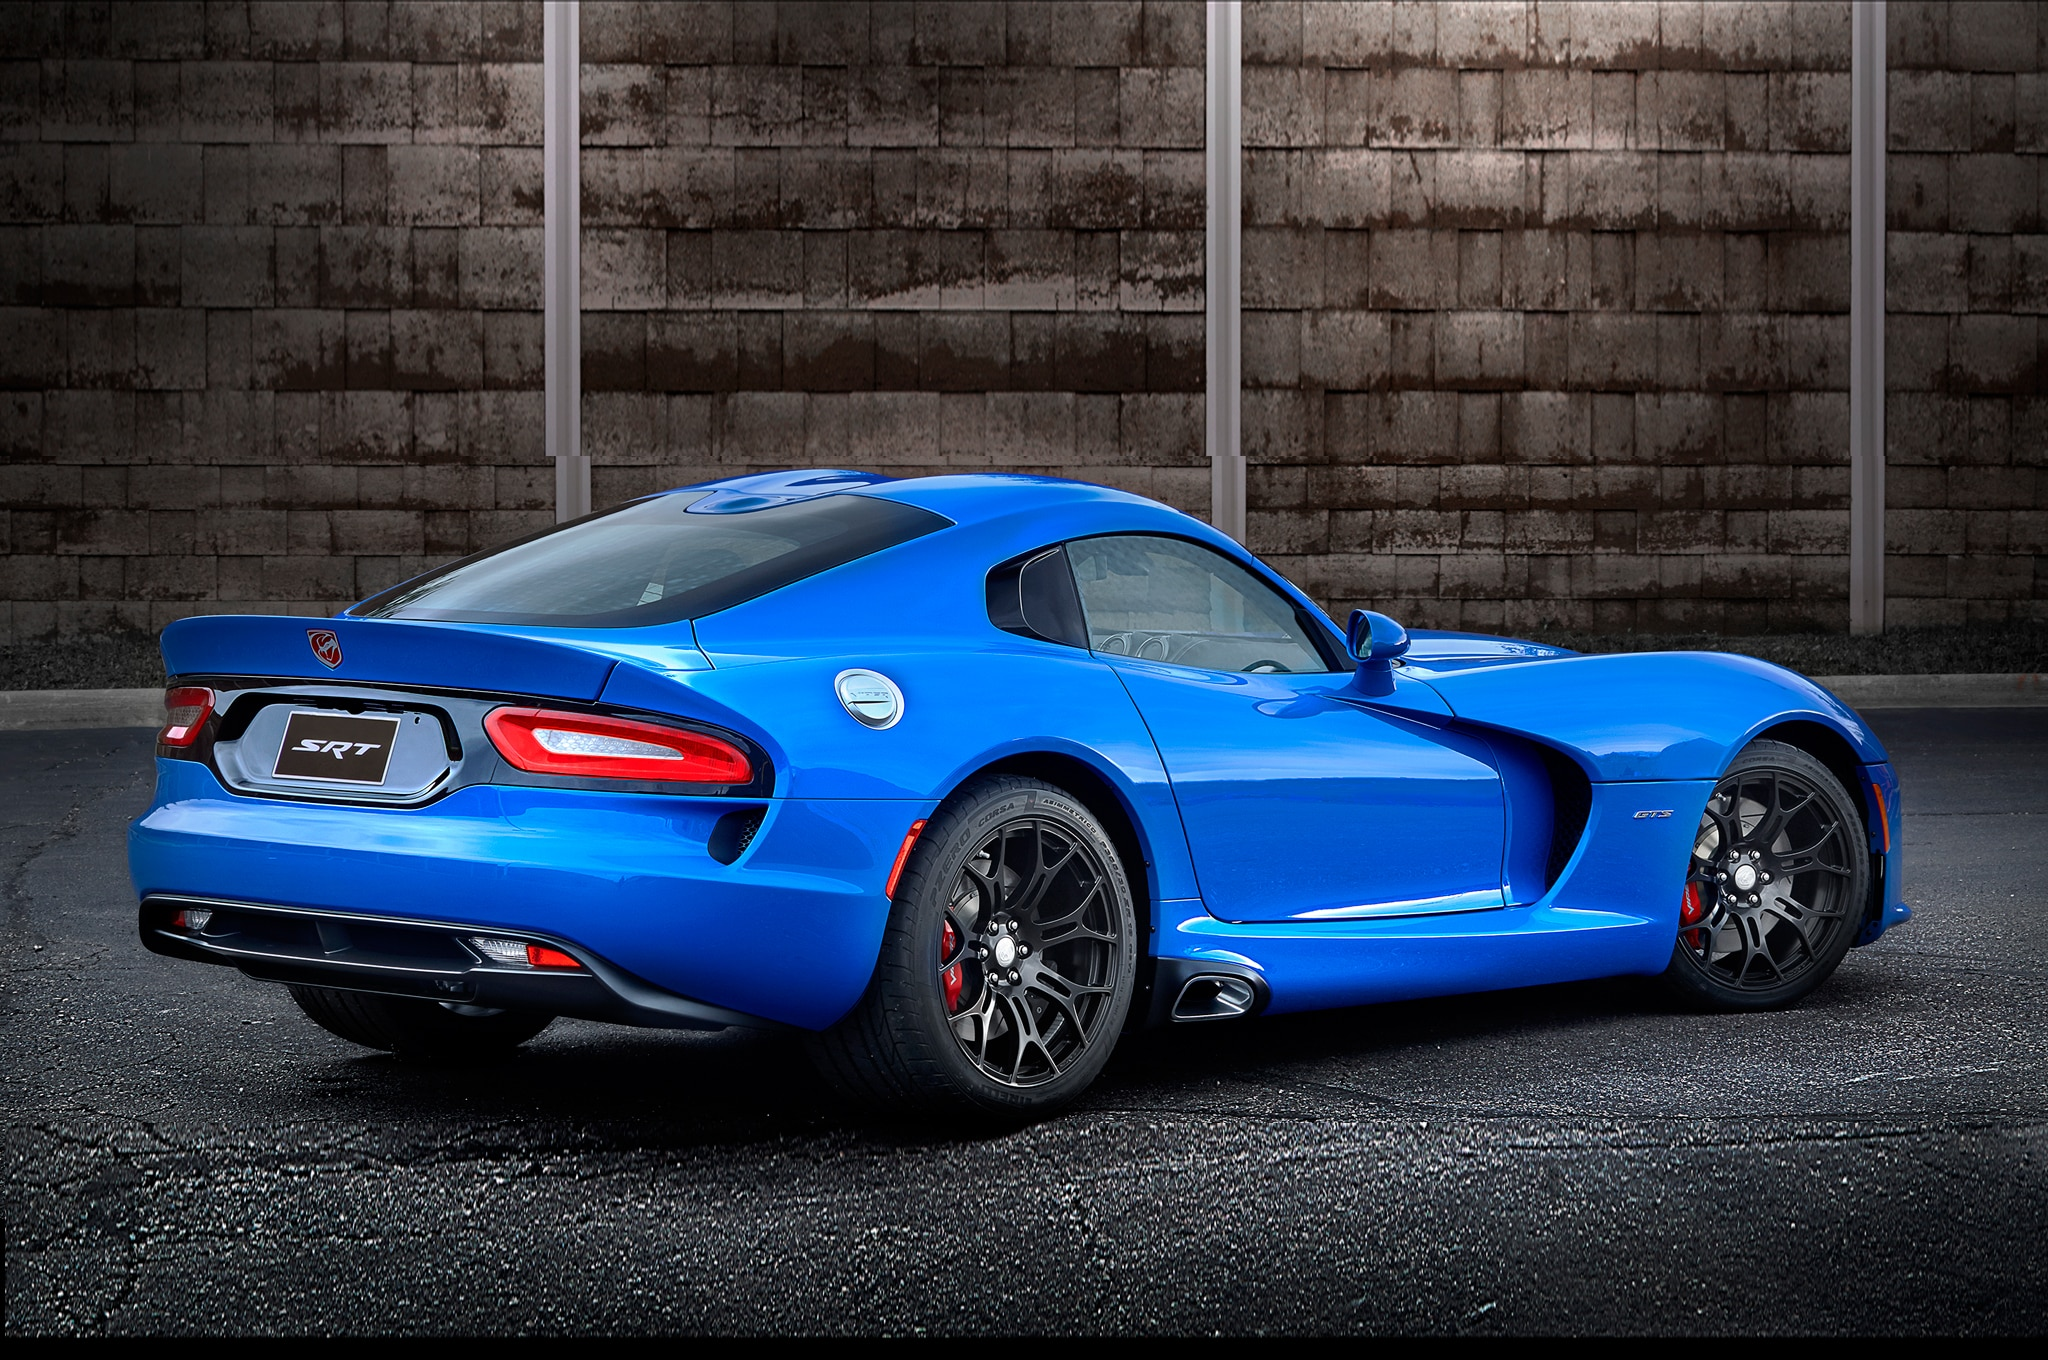 2015 Dodge Viper GT, Viper TA 2.0 Join SRT Stable